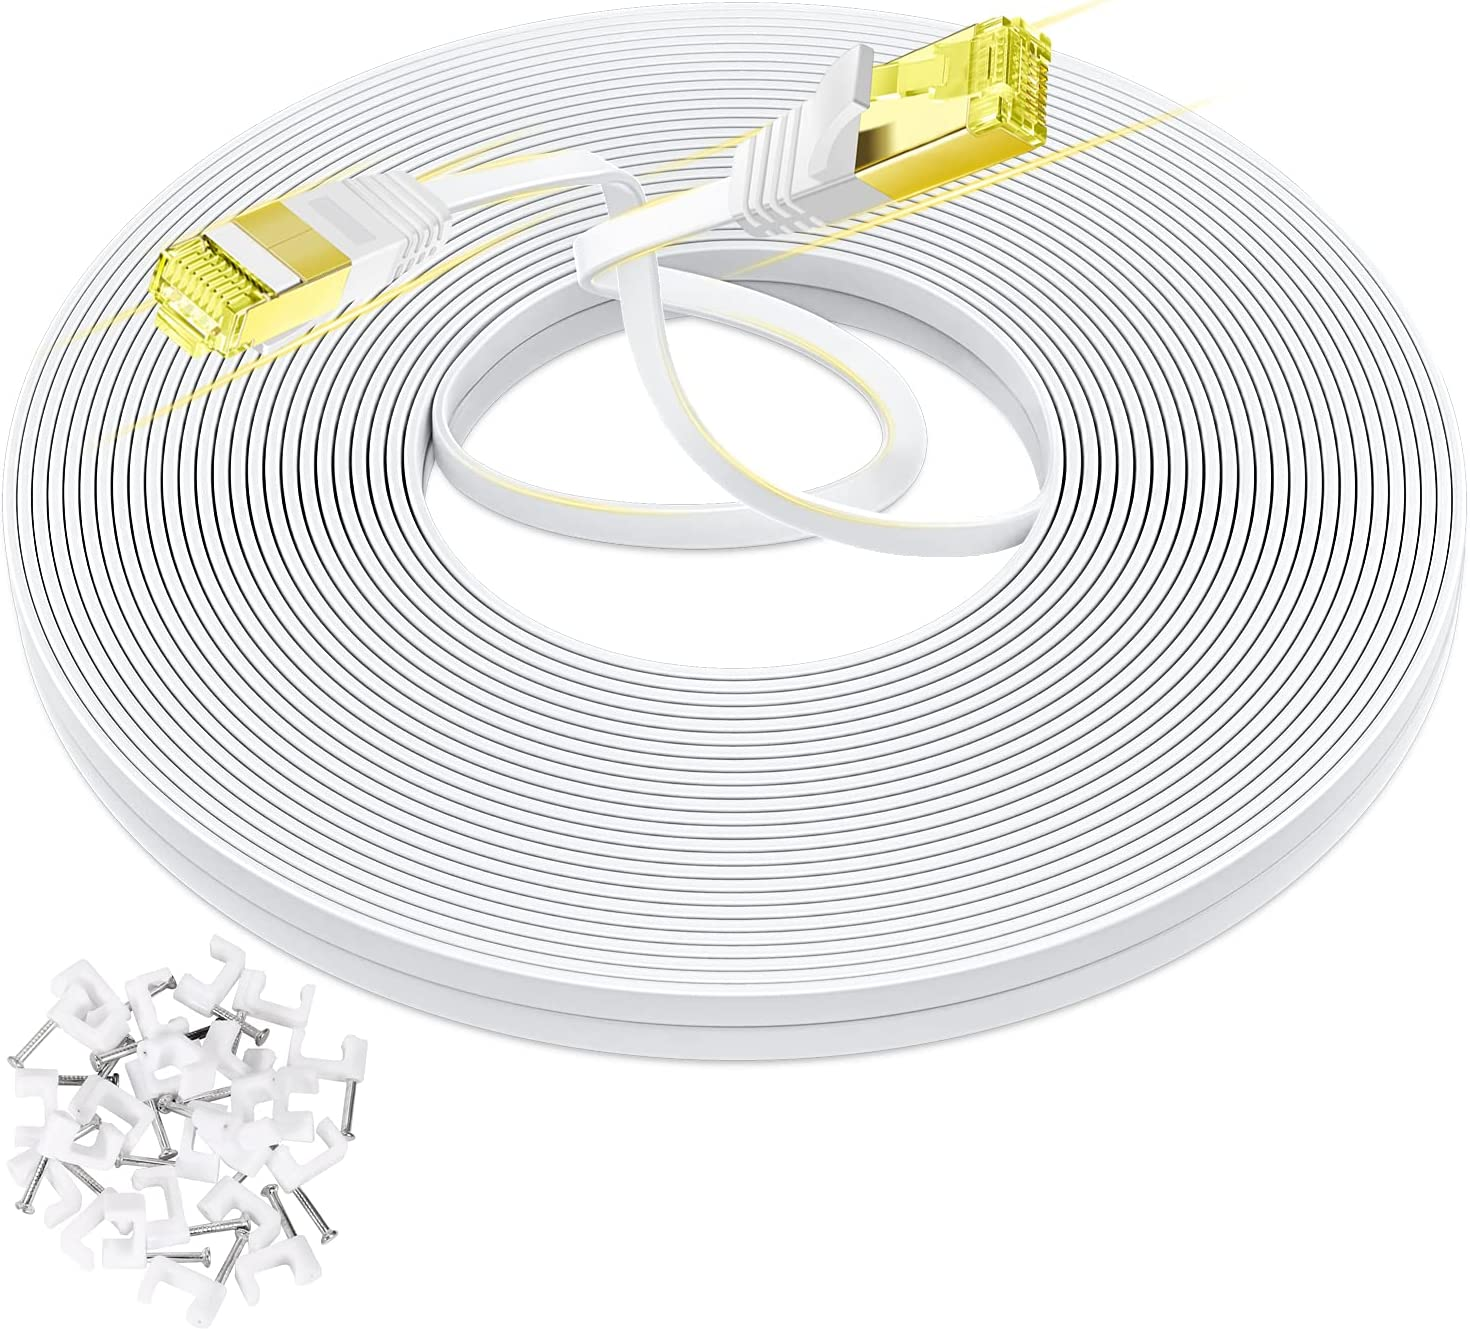 AoforzTech Cat 7 Ethernet Cable Double San Jose Mall Shielded ft 35 Arlington Mall Flat